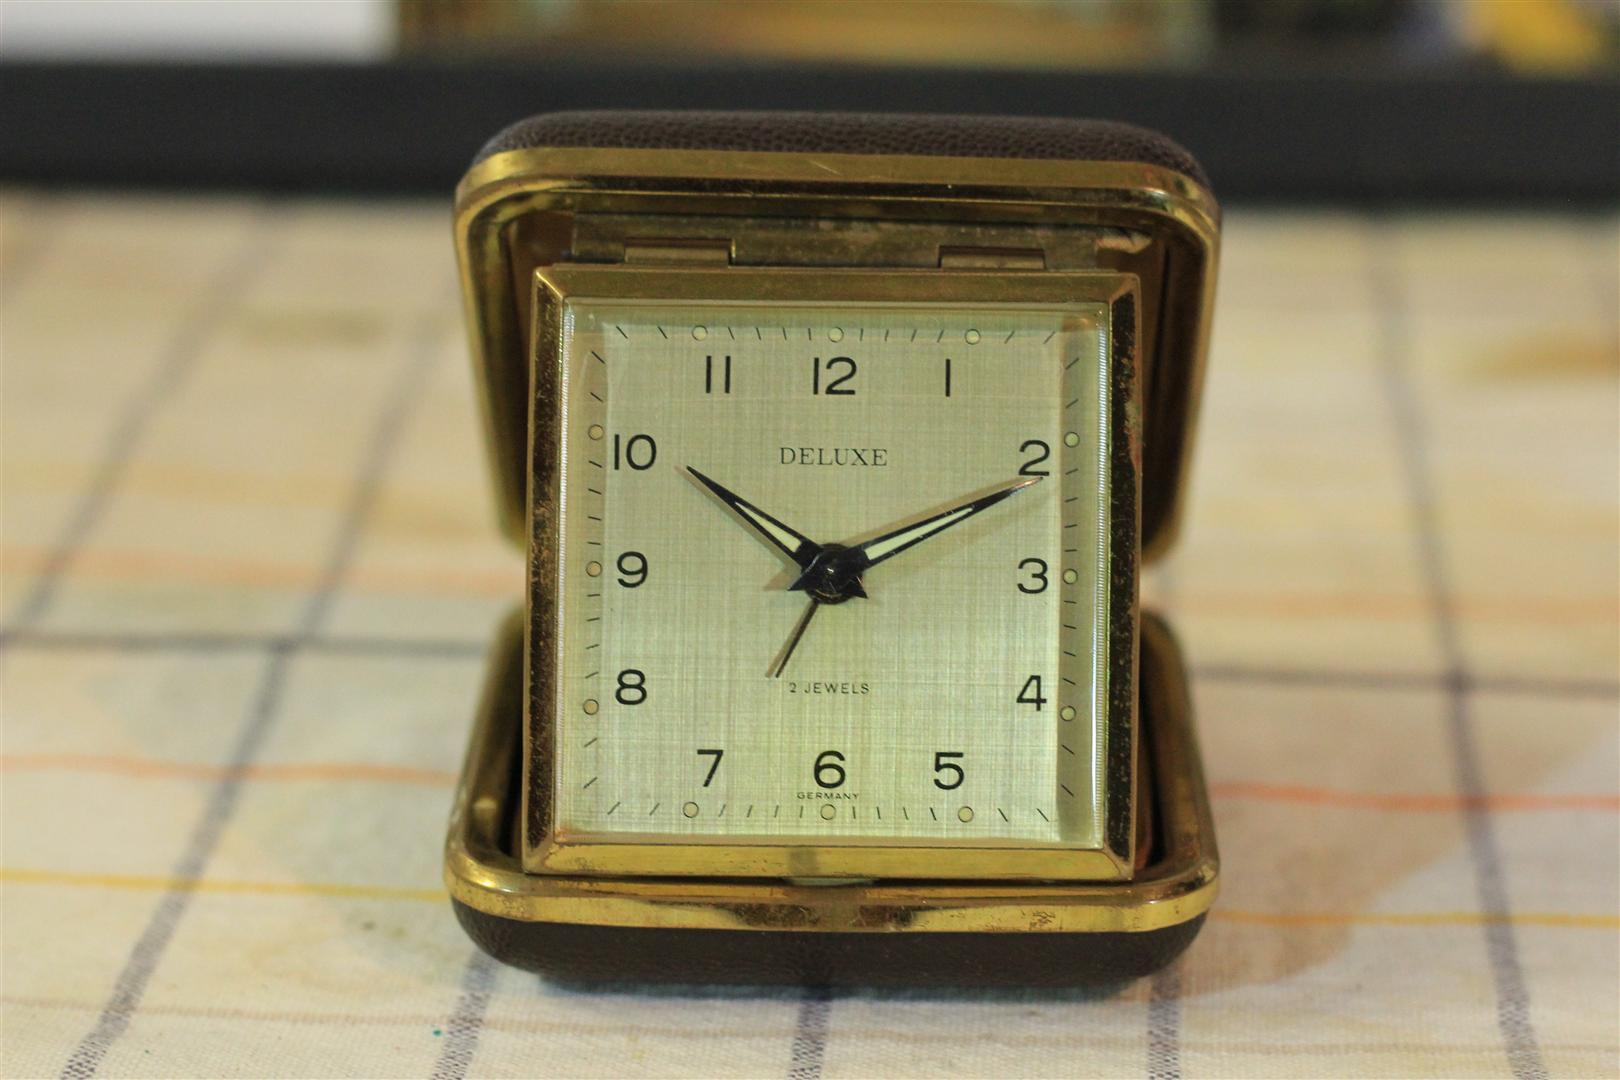 W0022 Deluxe 2 Jewels travel alarm clock